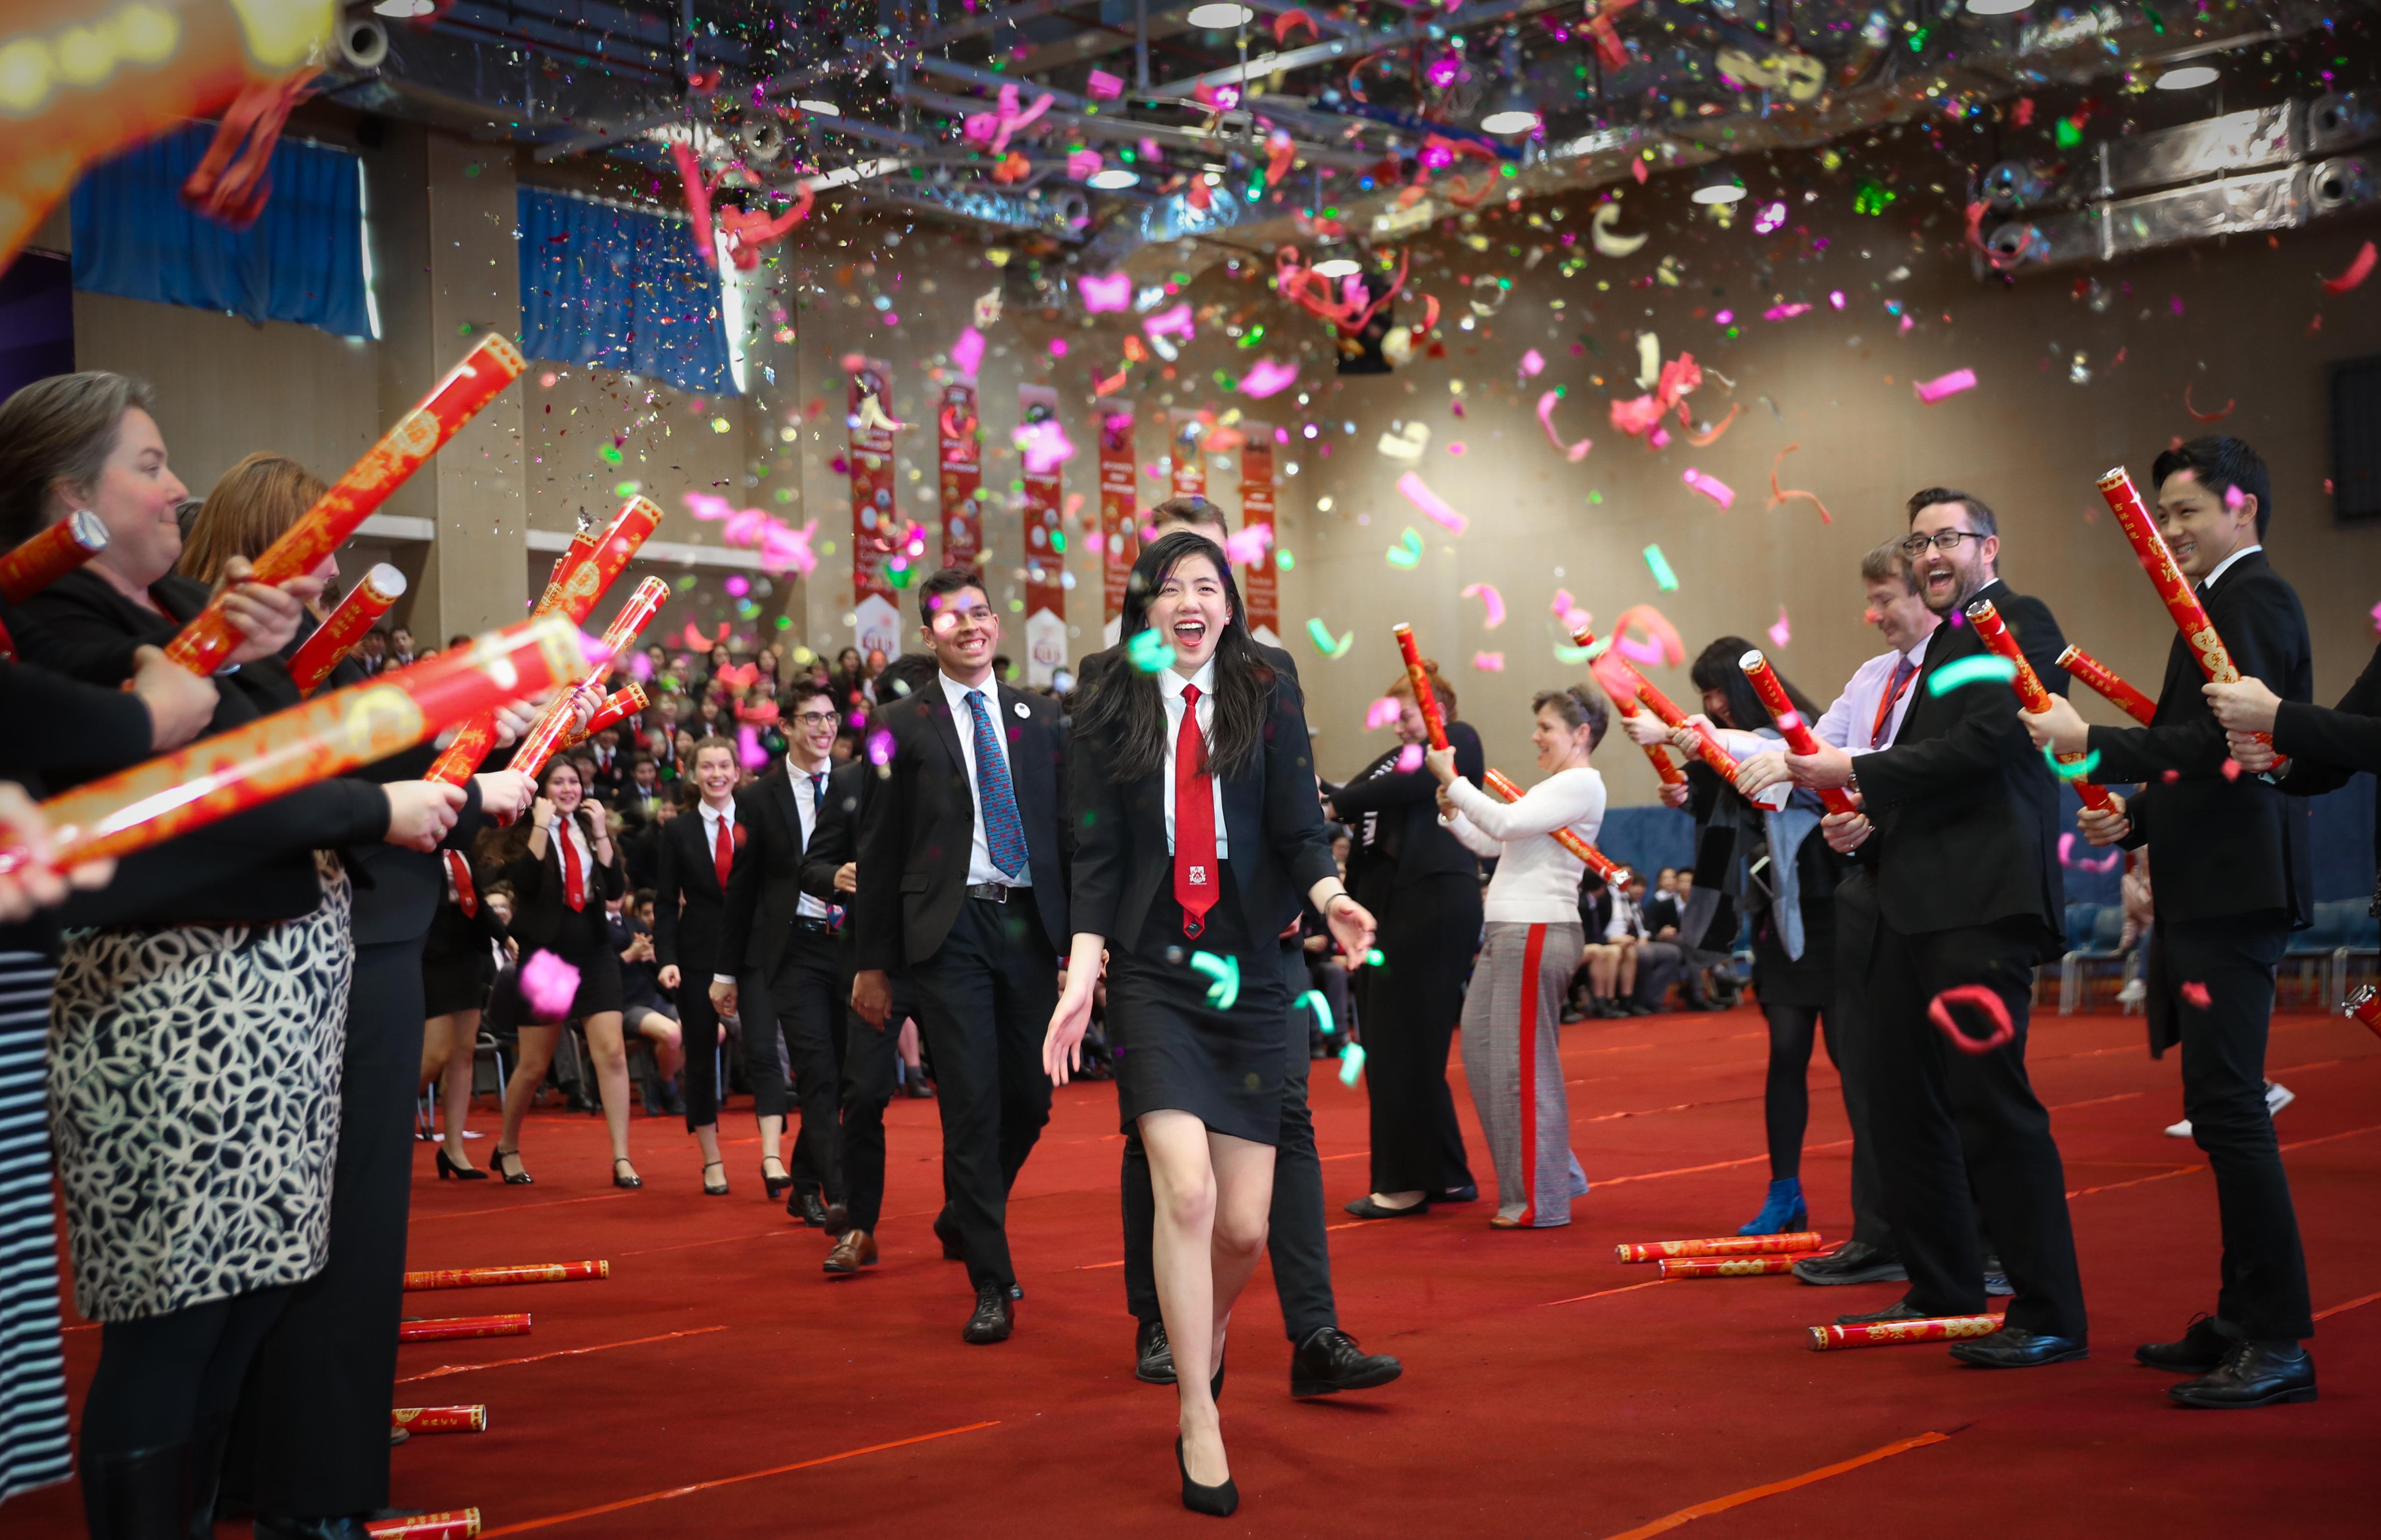 graduation-photo-3-Dulwich_College_Shanghai_Pudong-20200910-122727-299